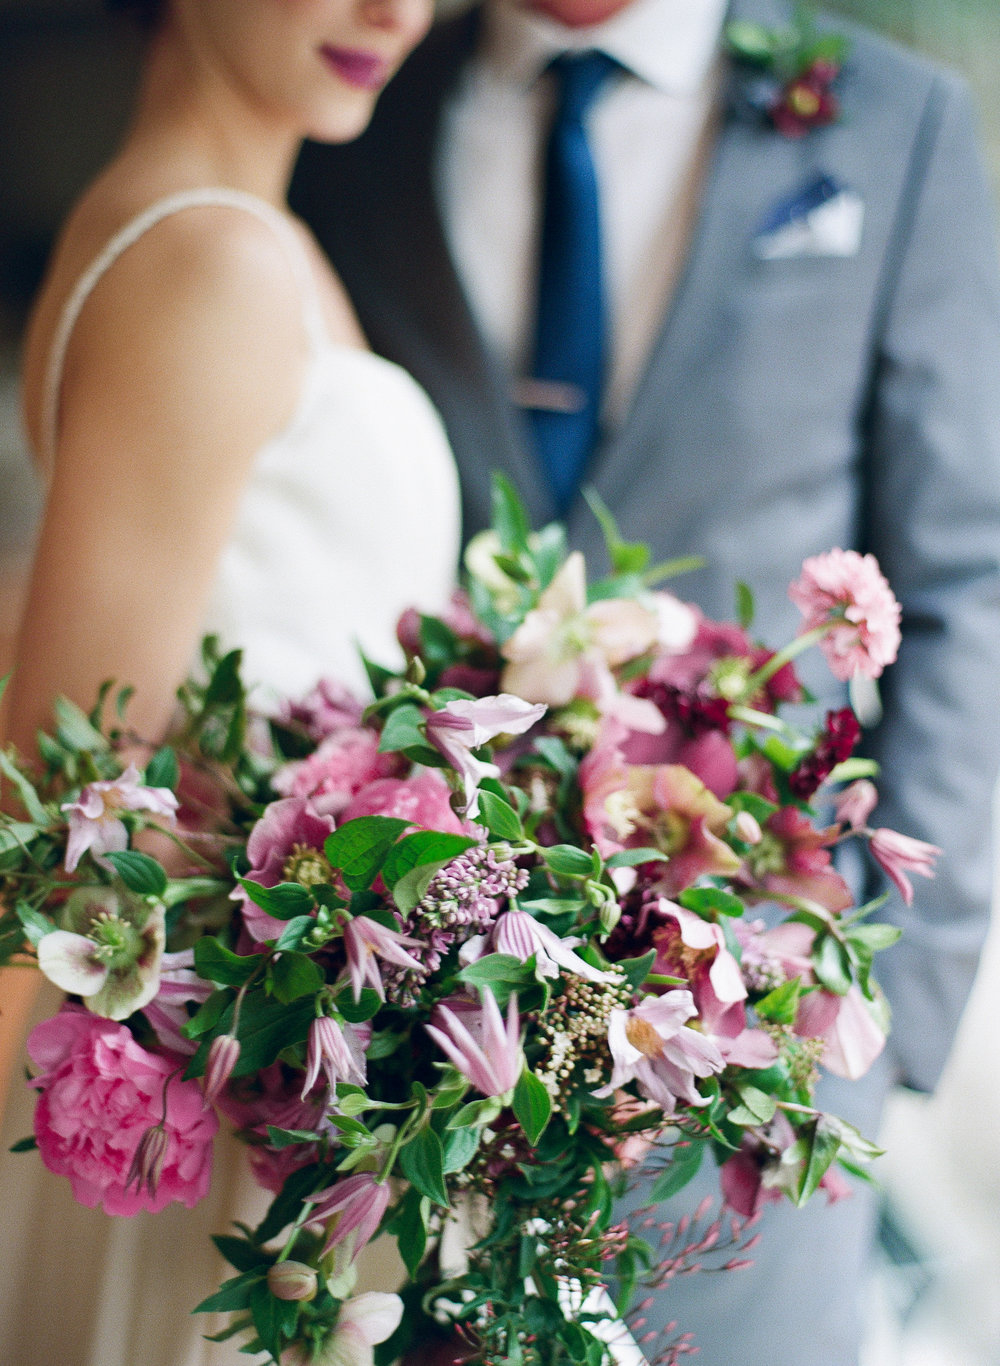 TheWildflowers_RosewoodCrescent_byKaylaBarker(92).jpg